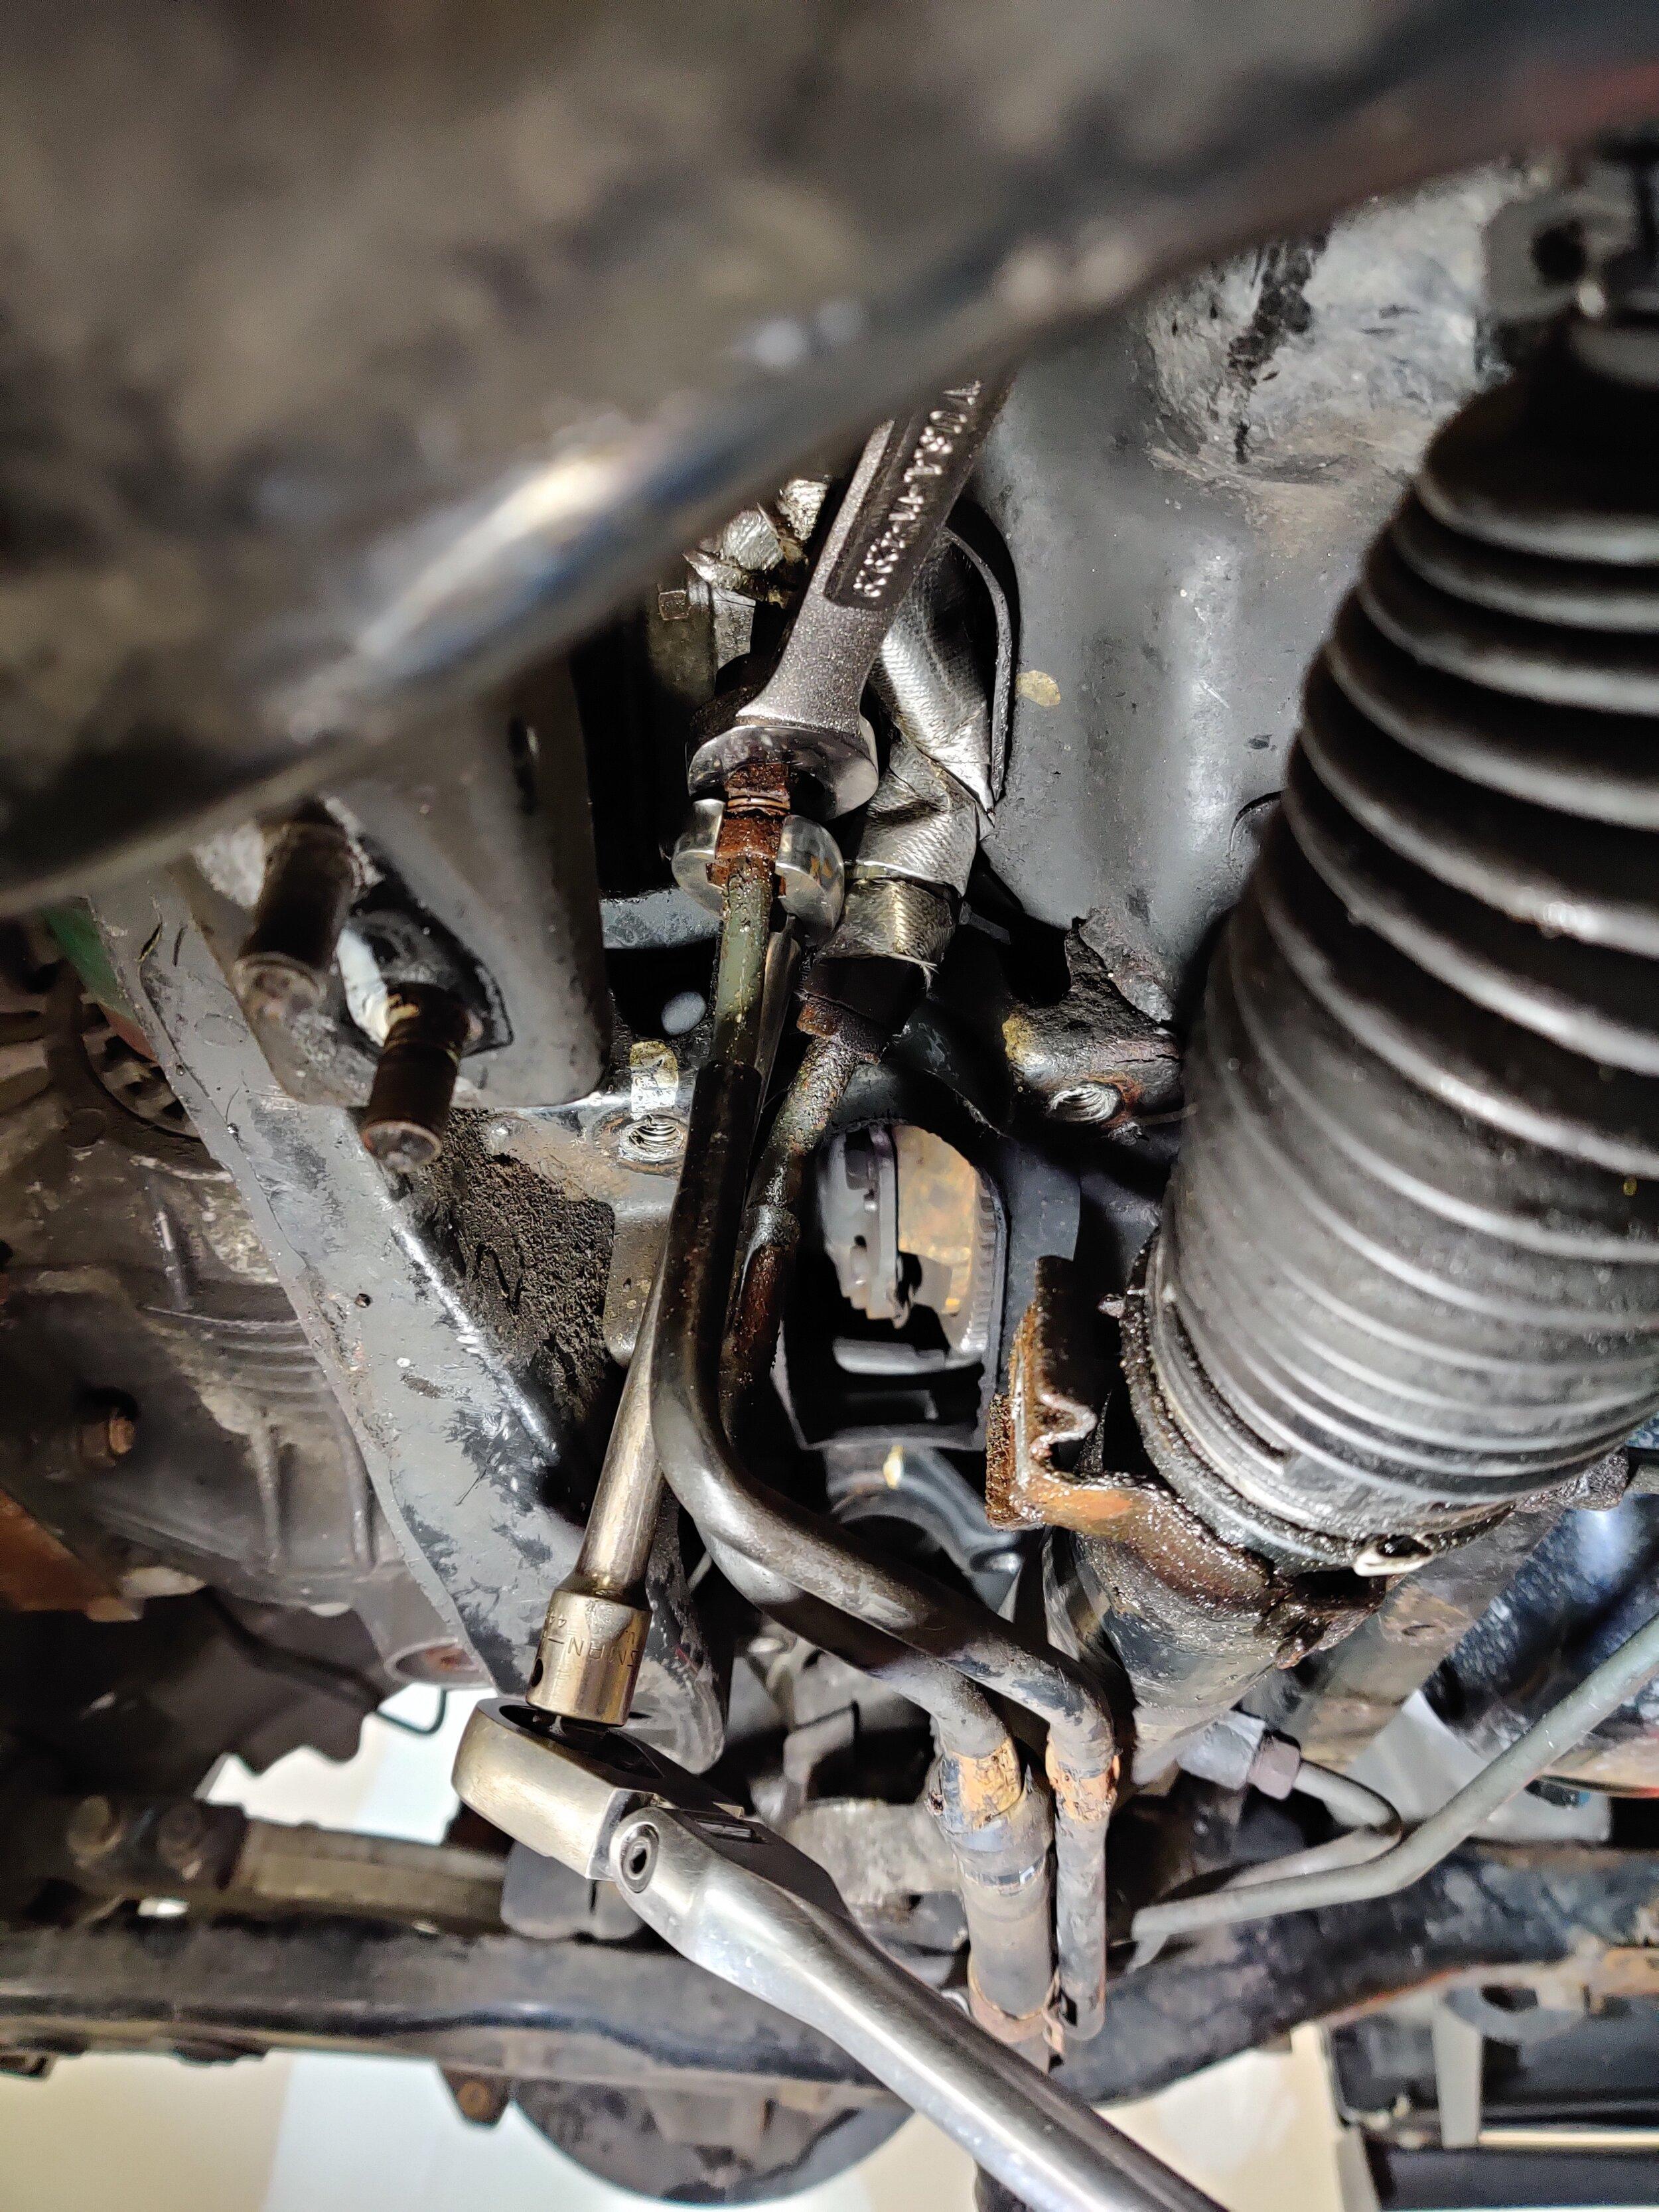 15 sti steering rack install on a 2005